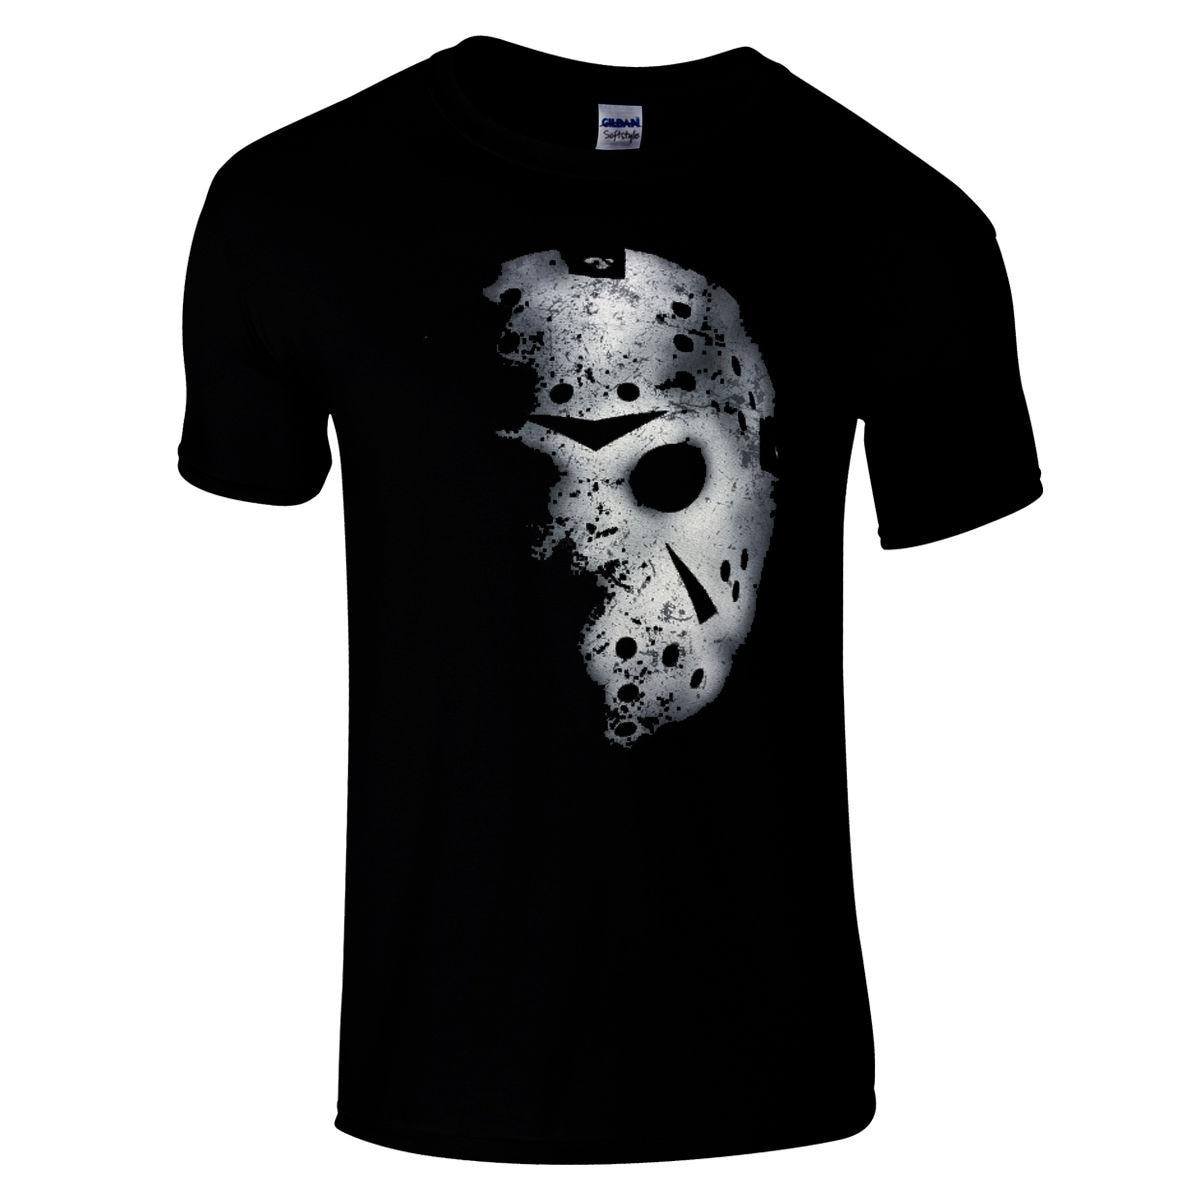 Jason Voorhees Hockey Mask Premium black regular fit horror T Shirt friday 13th Cool Casual pride t shirt men Unisex New